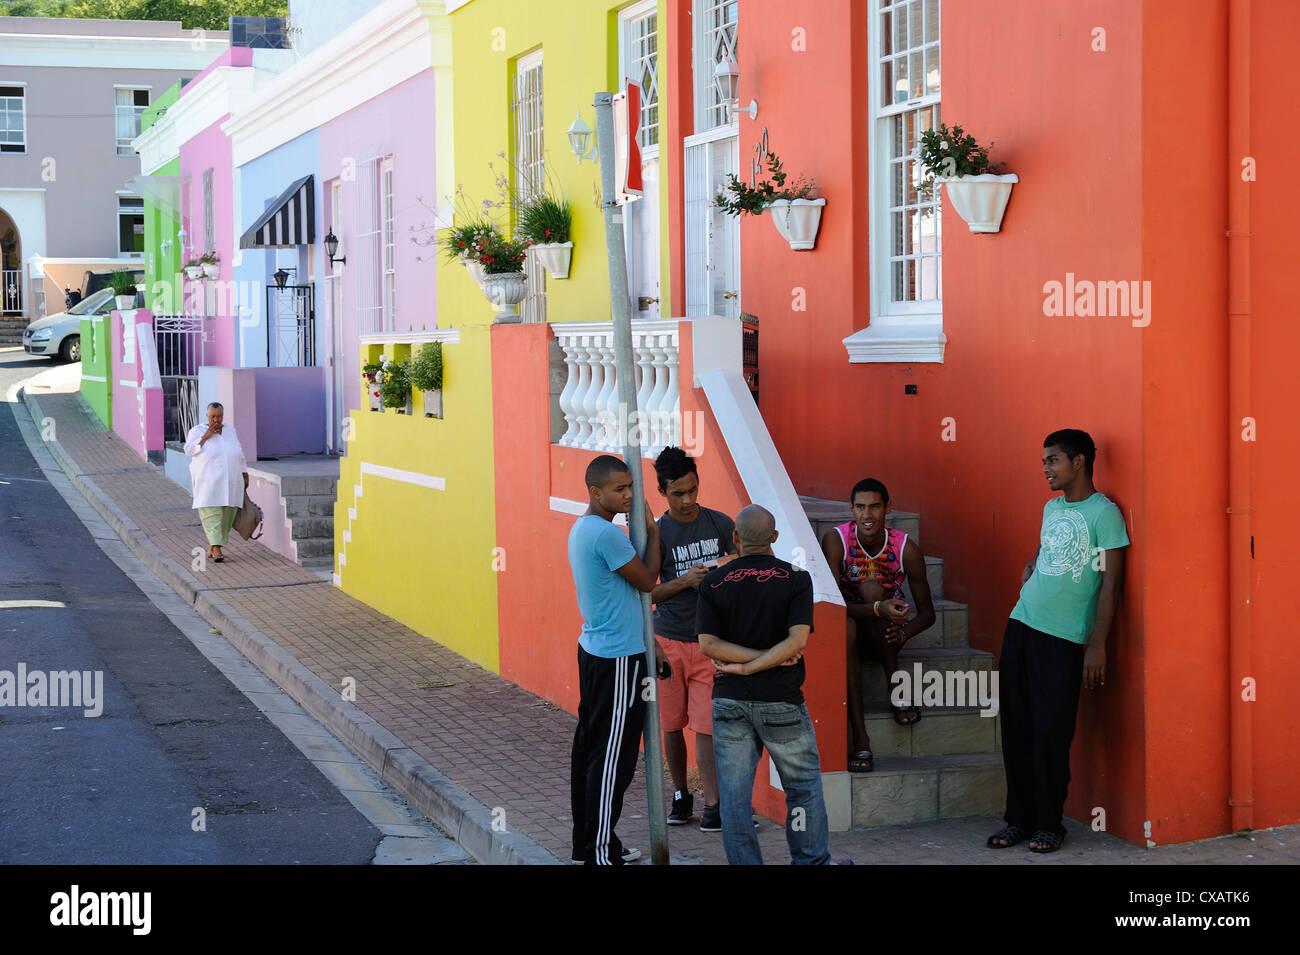 Casas coloridas, área Bo-Cape, habitantes Malayos, Cape Town, Sudáfrica, África Imagen De Stock